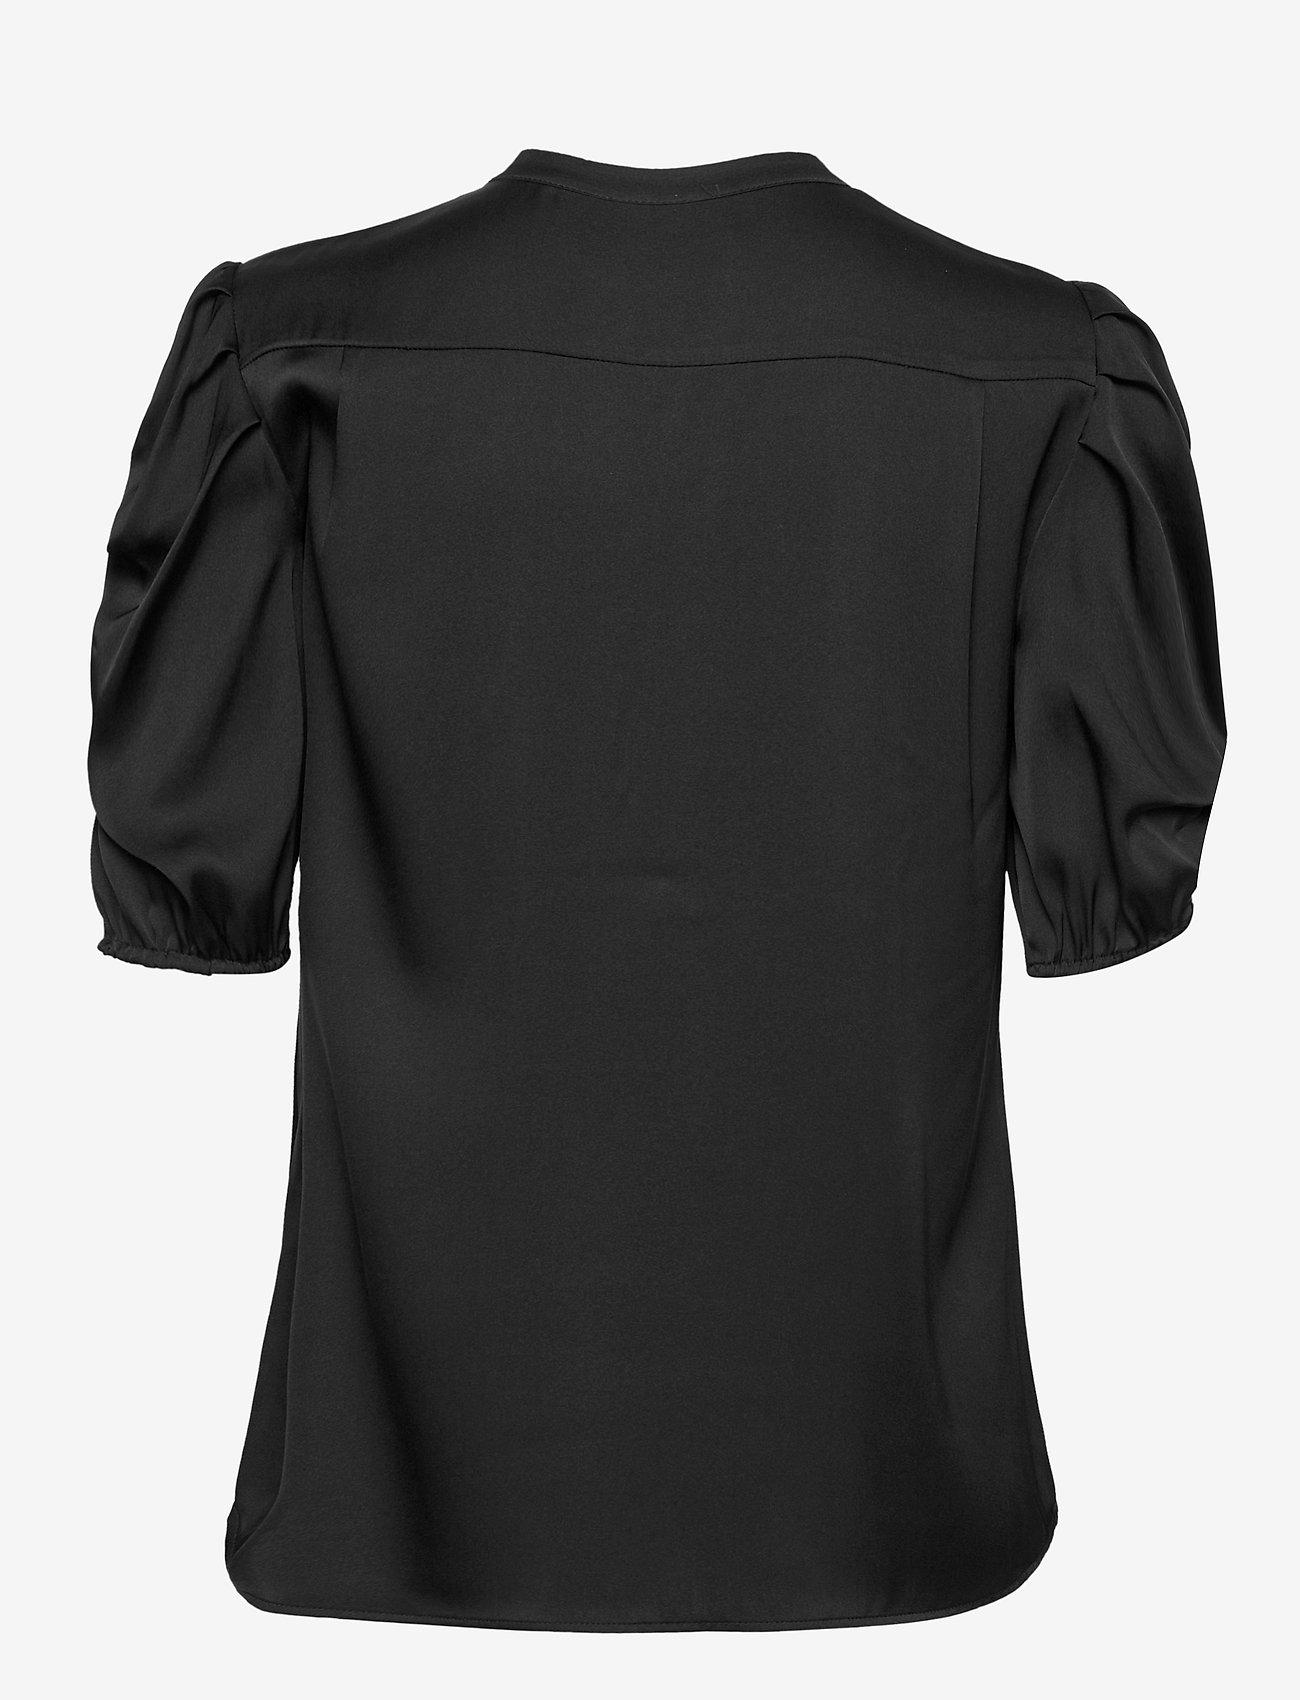 SAND - Satin Stretch - Naolin - short-sleeved blouses - black - 1